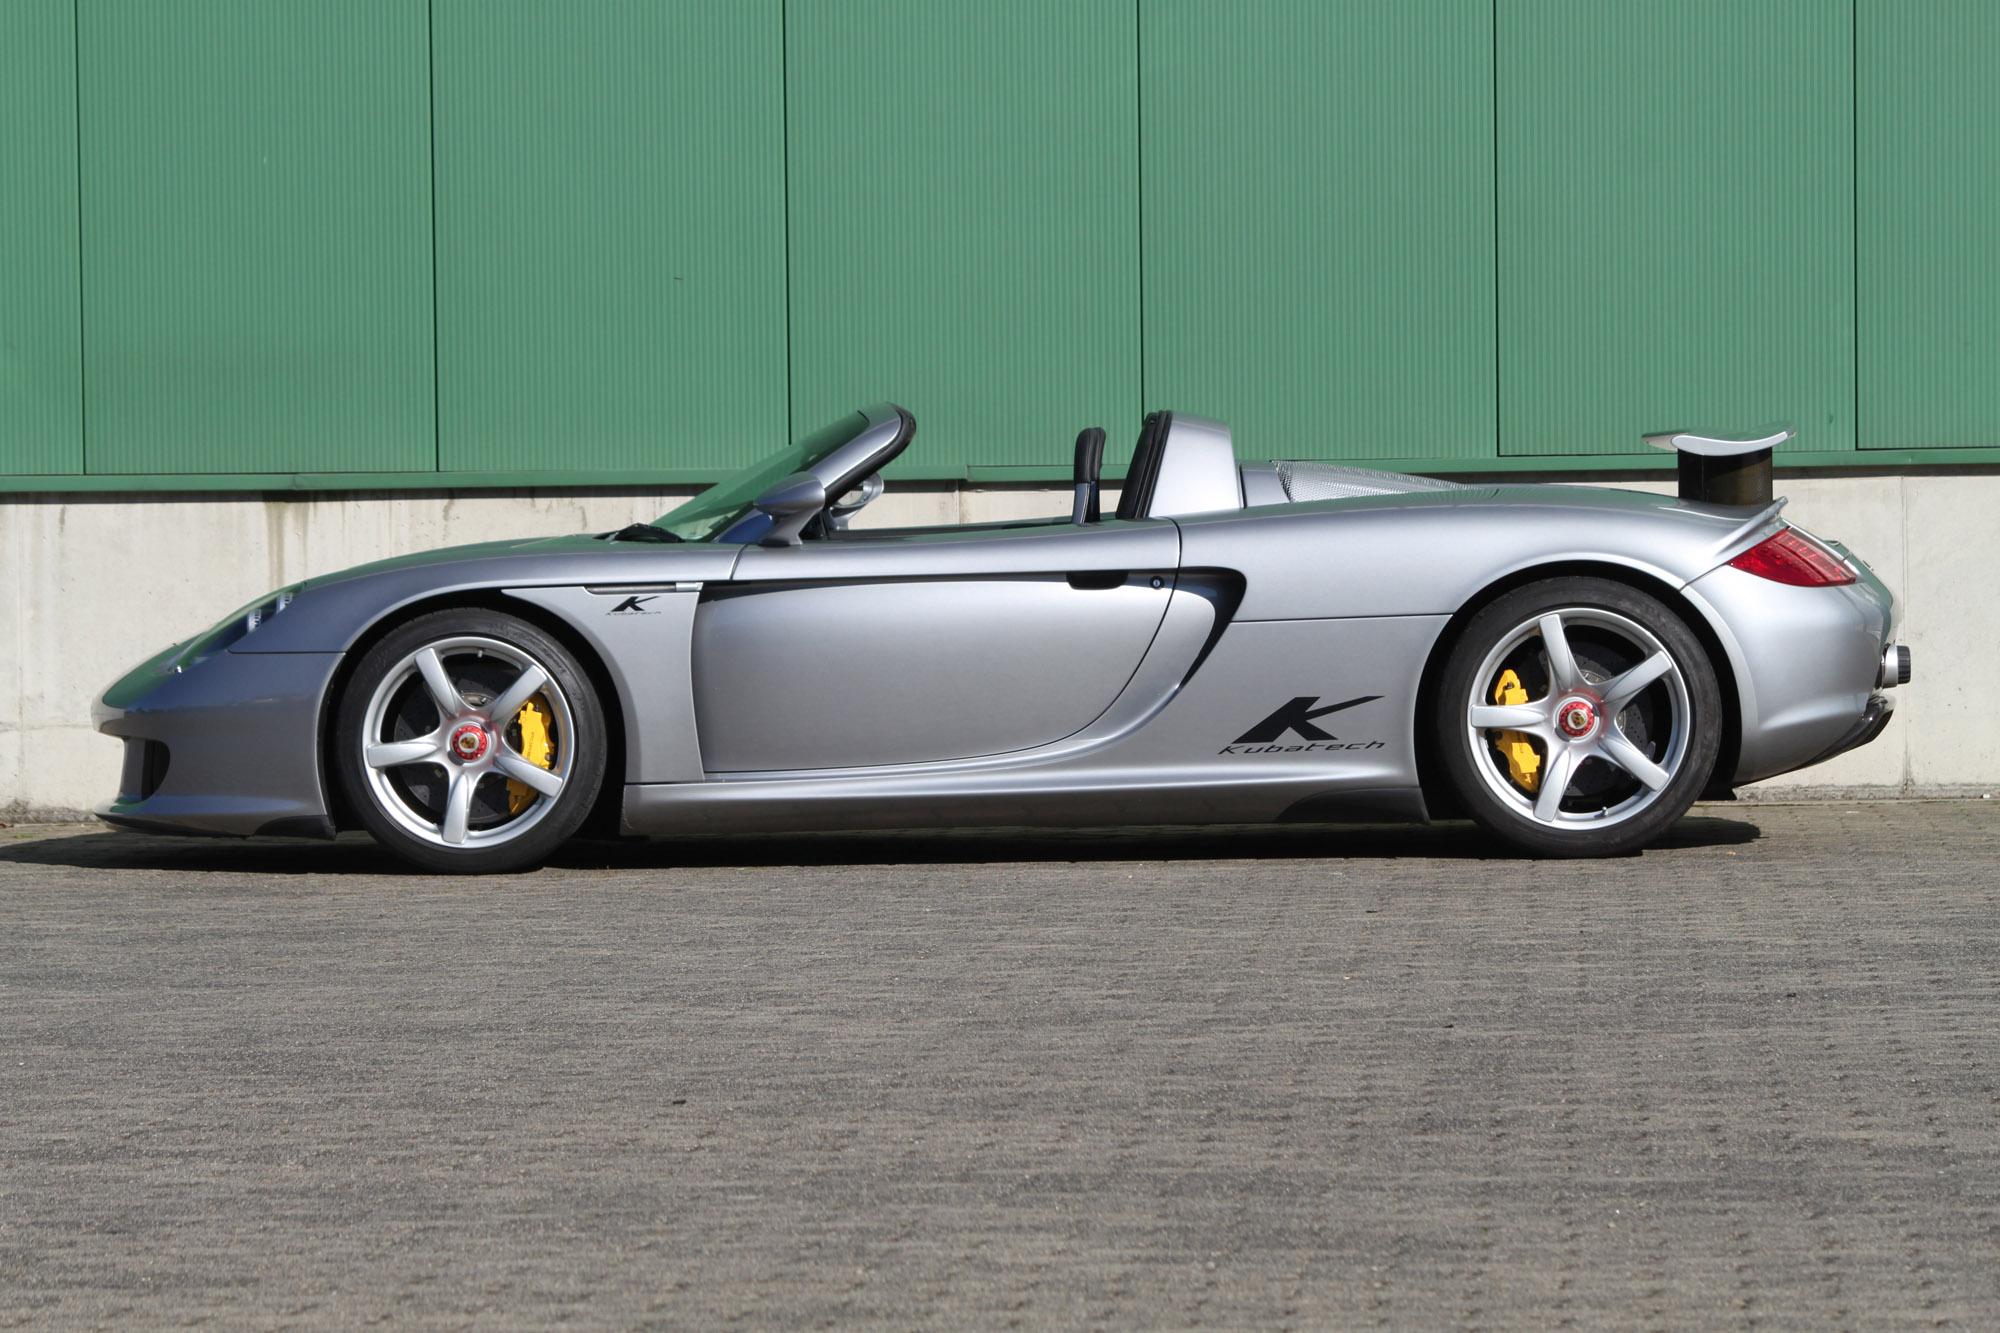 Porsche Carrera gt Price India Porsche Carrera gt